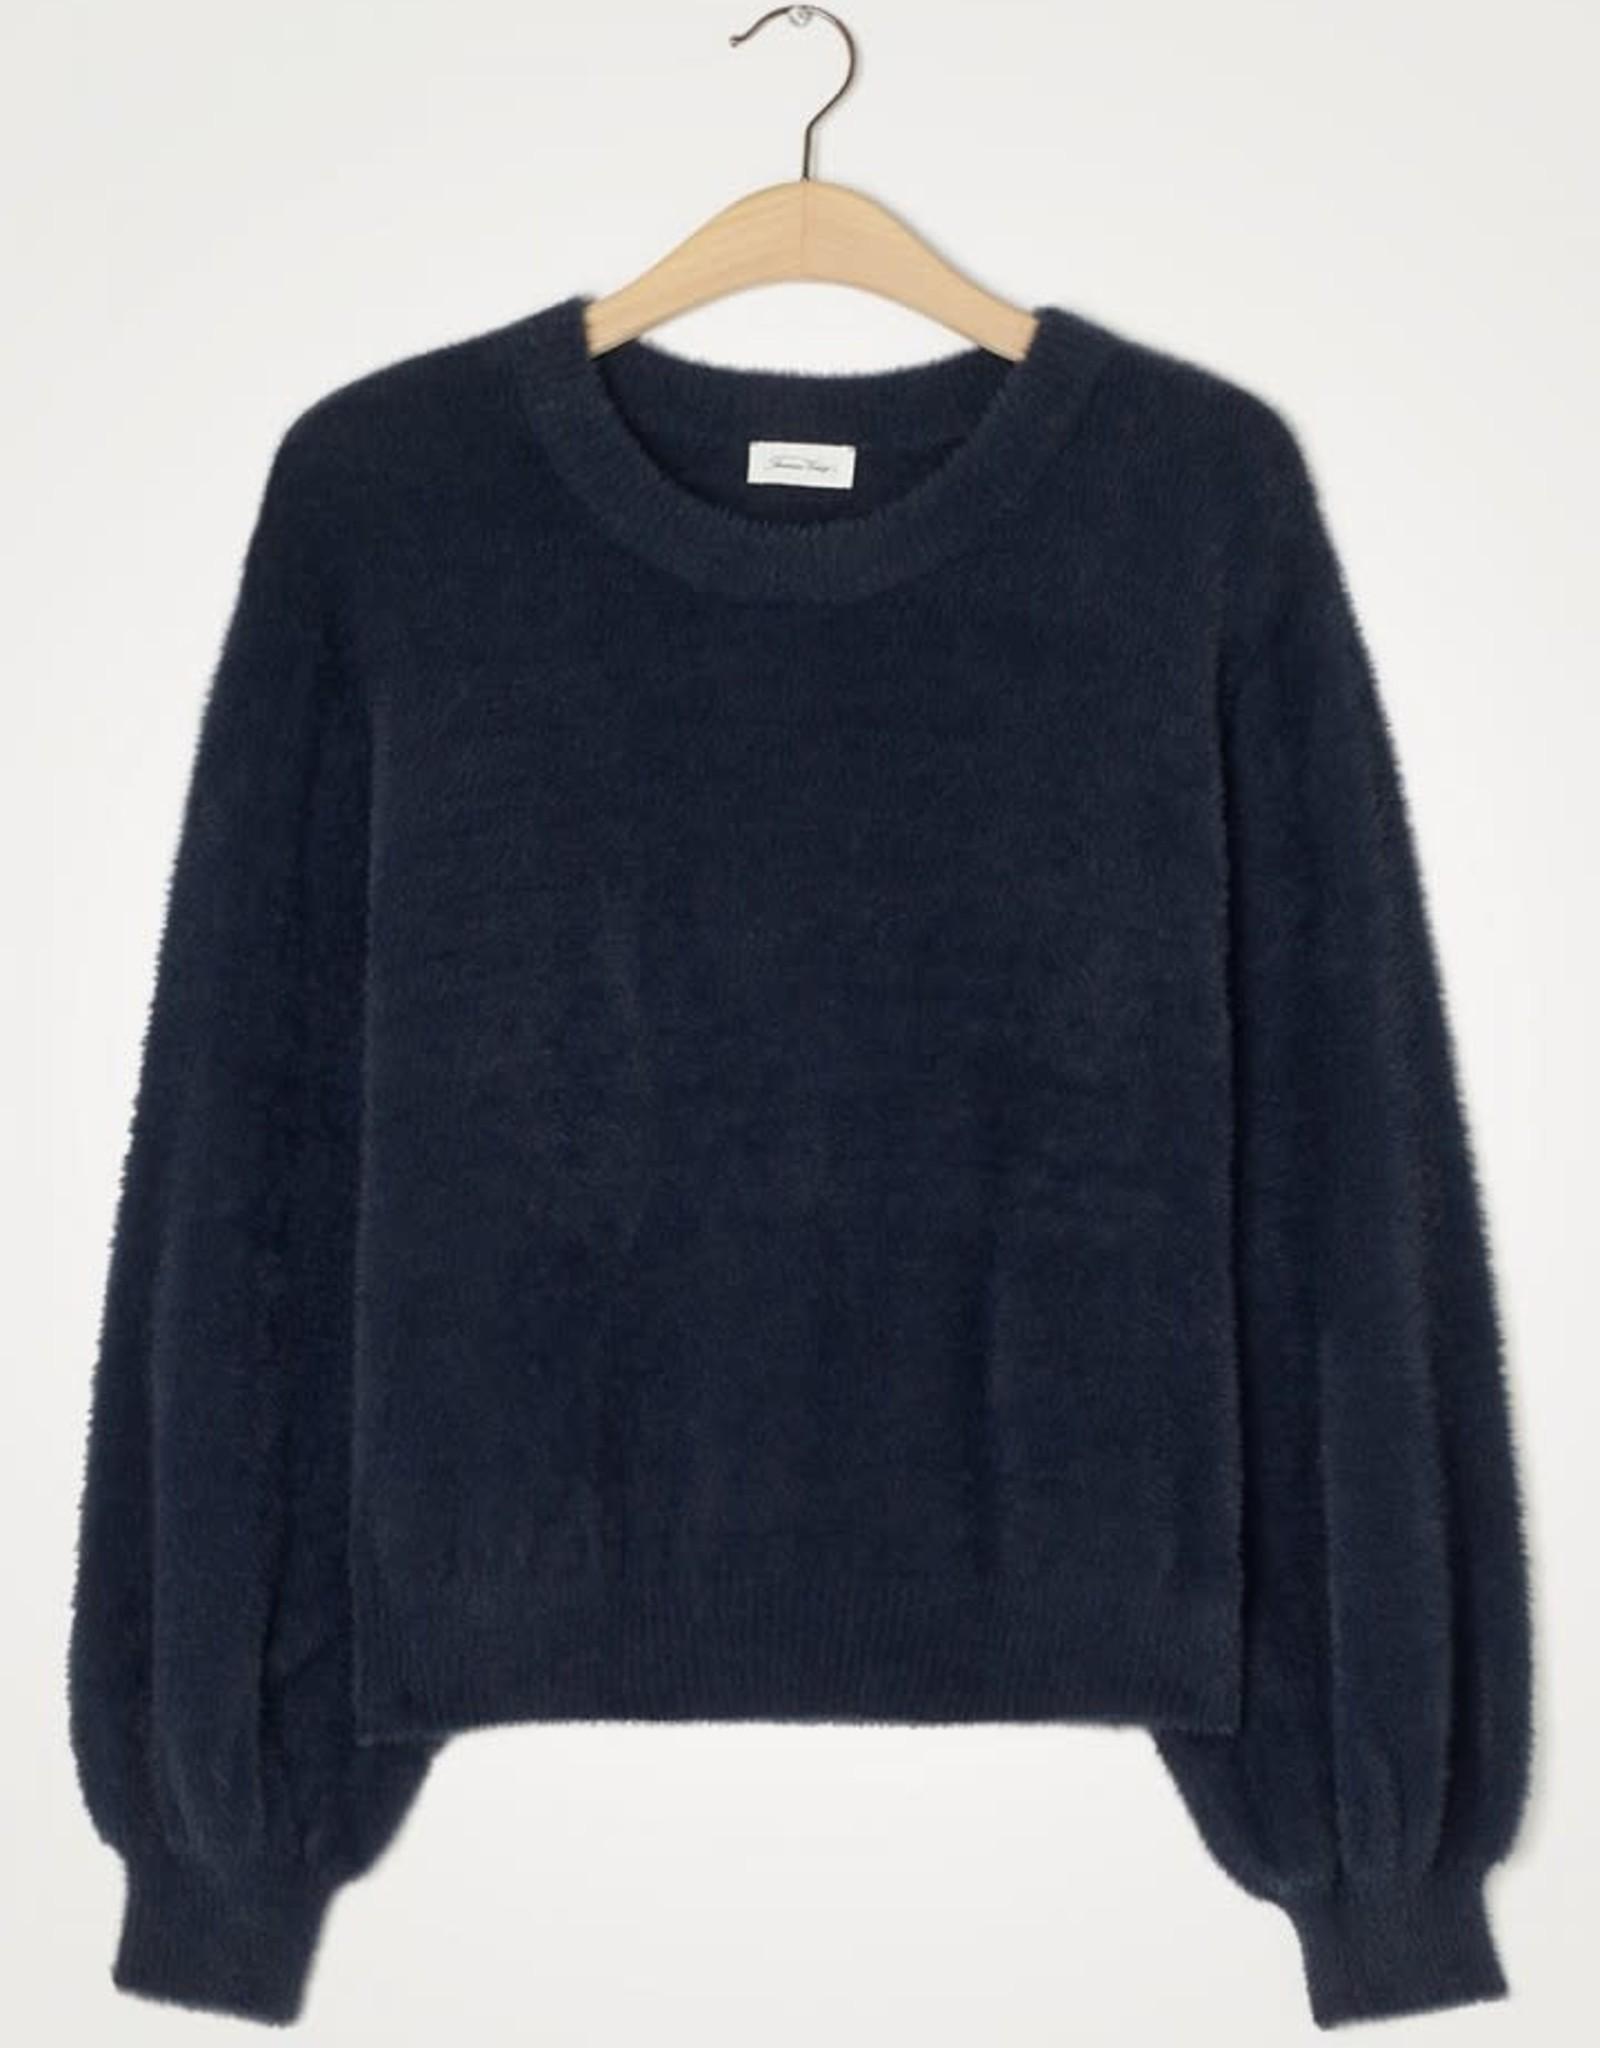 American Vintage Pull/Sweater 'Egpik' - Navy - American Vintage